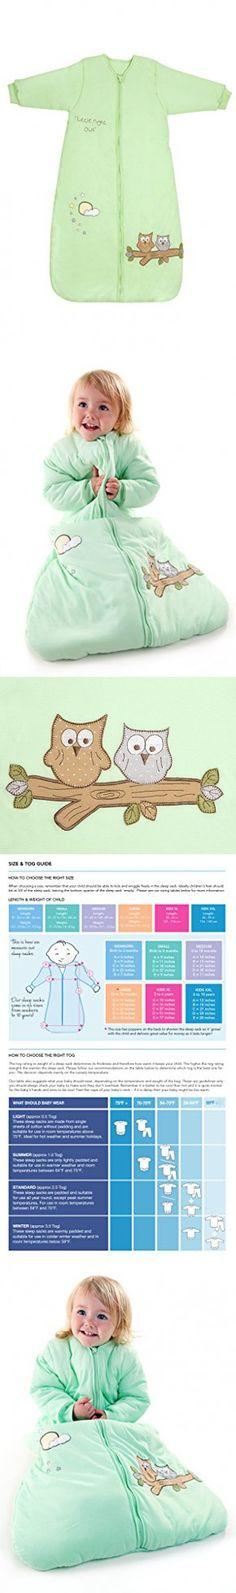 Winter Baby Sleep Sack Long Sleeves Wearable Blanket 3.5 Tog - Mint Owl - 0-6 months/Small